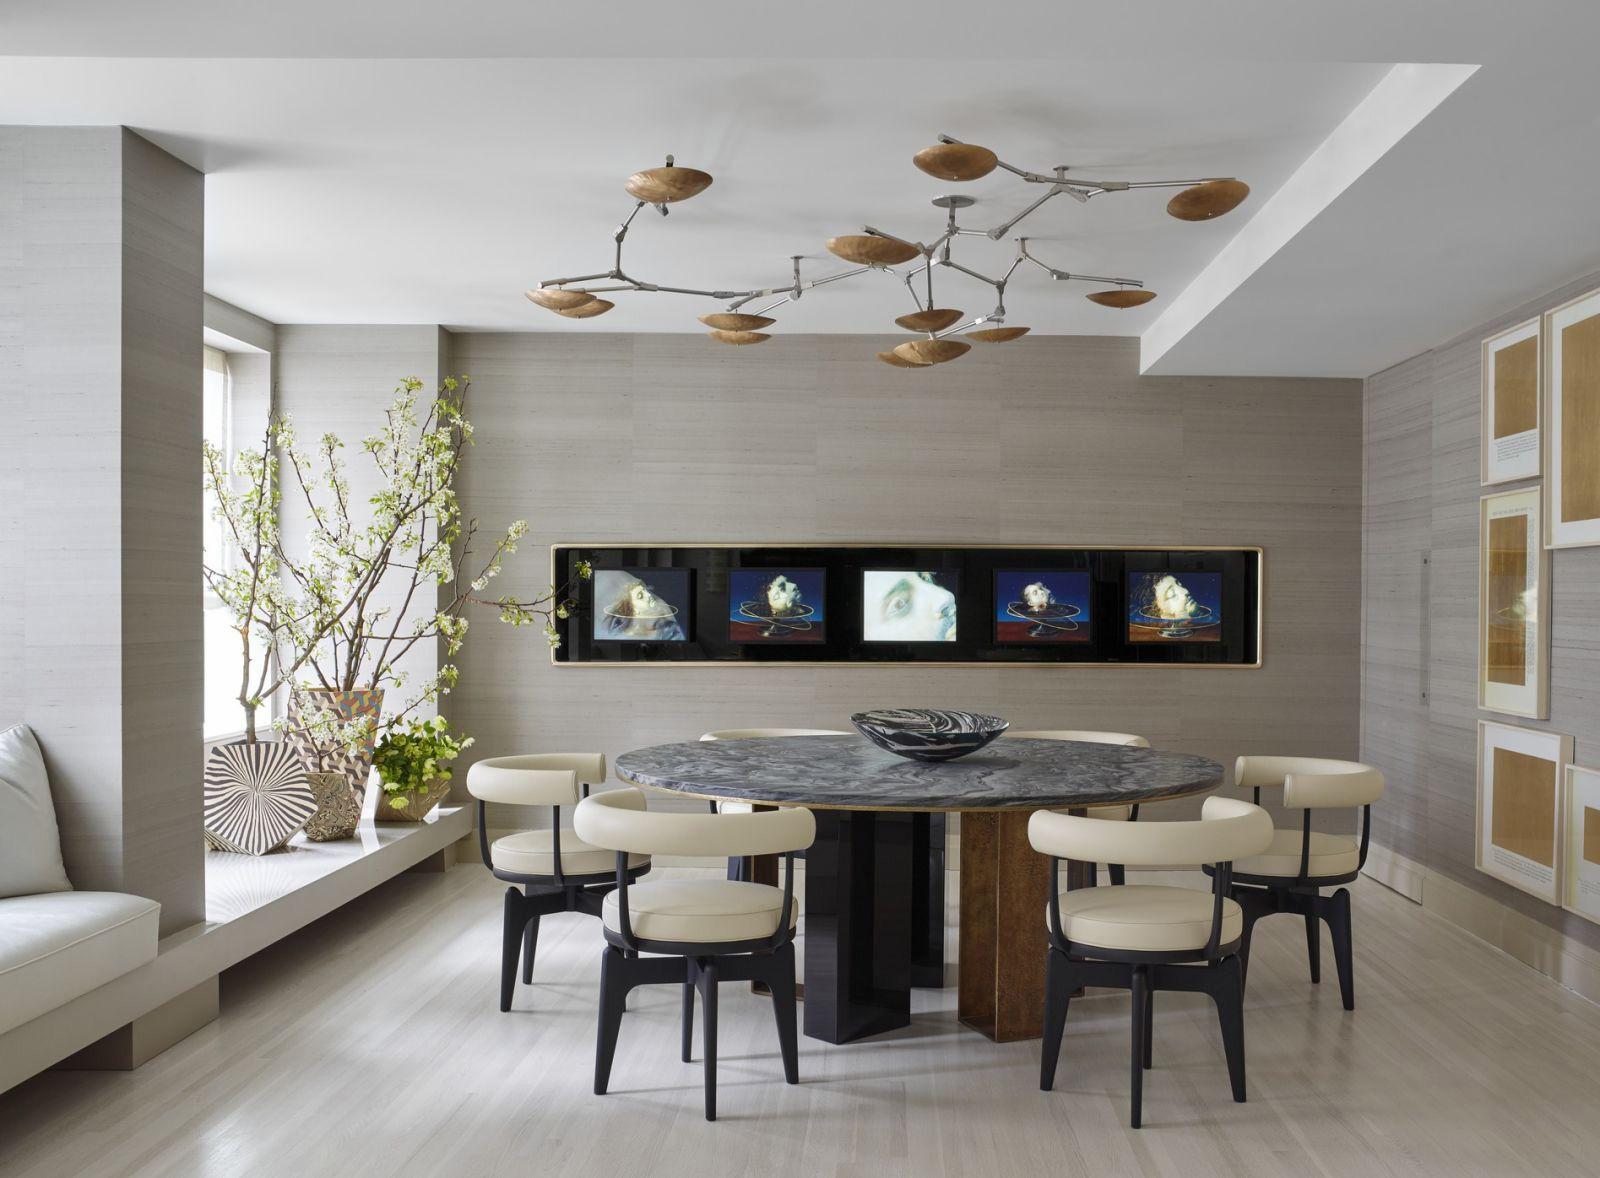 Herve Van Der Straeten Dining Table With Charlotte Perriand Chairs And White Oak Flooring ED November Designer Kelly Behun